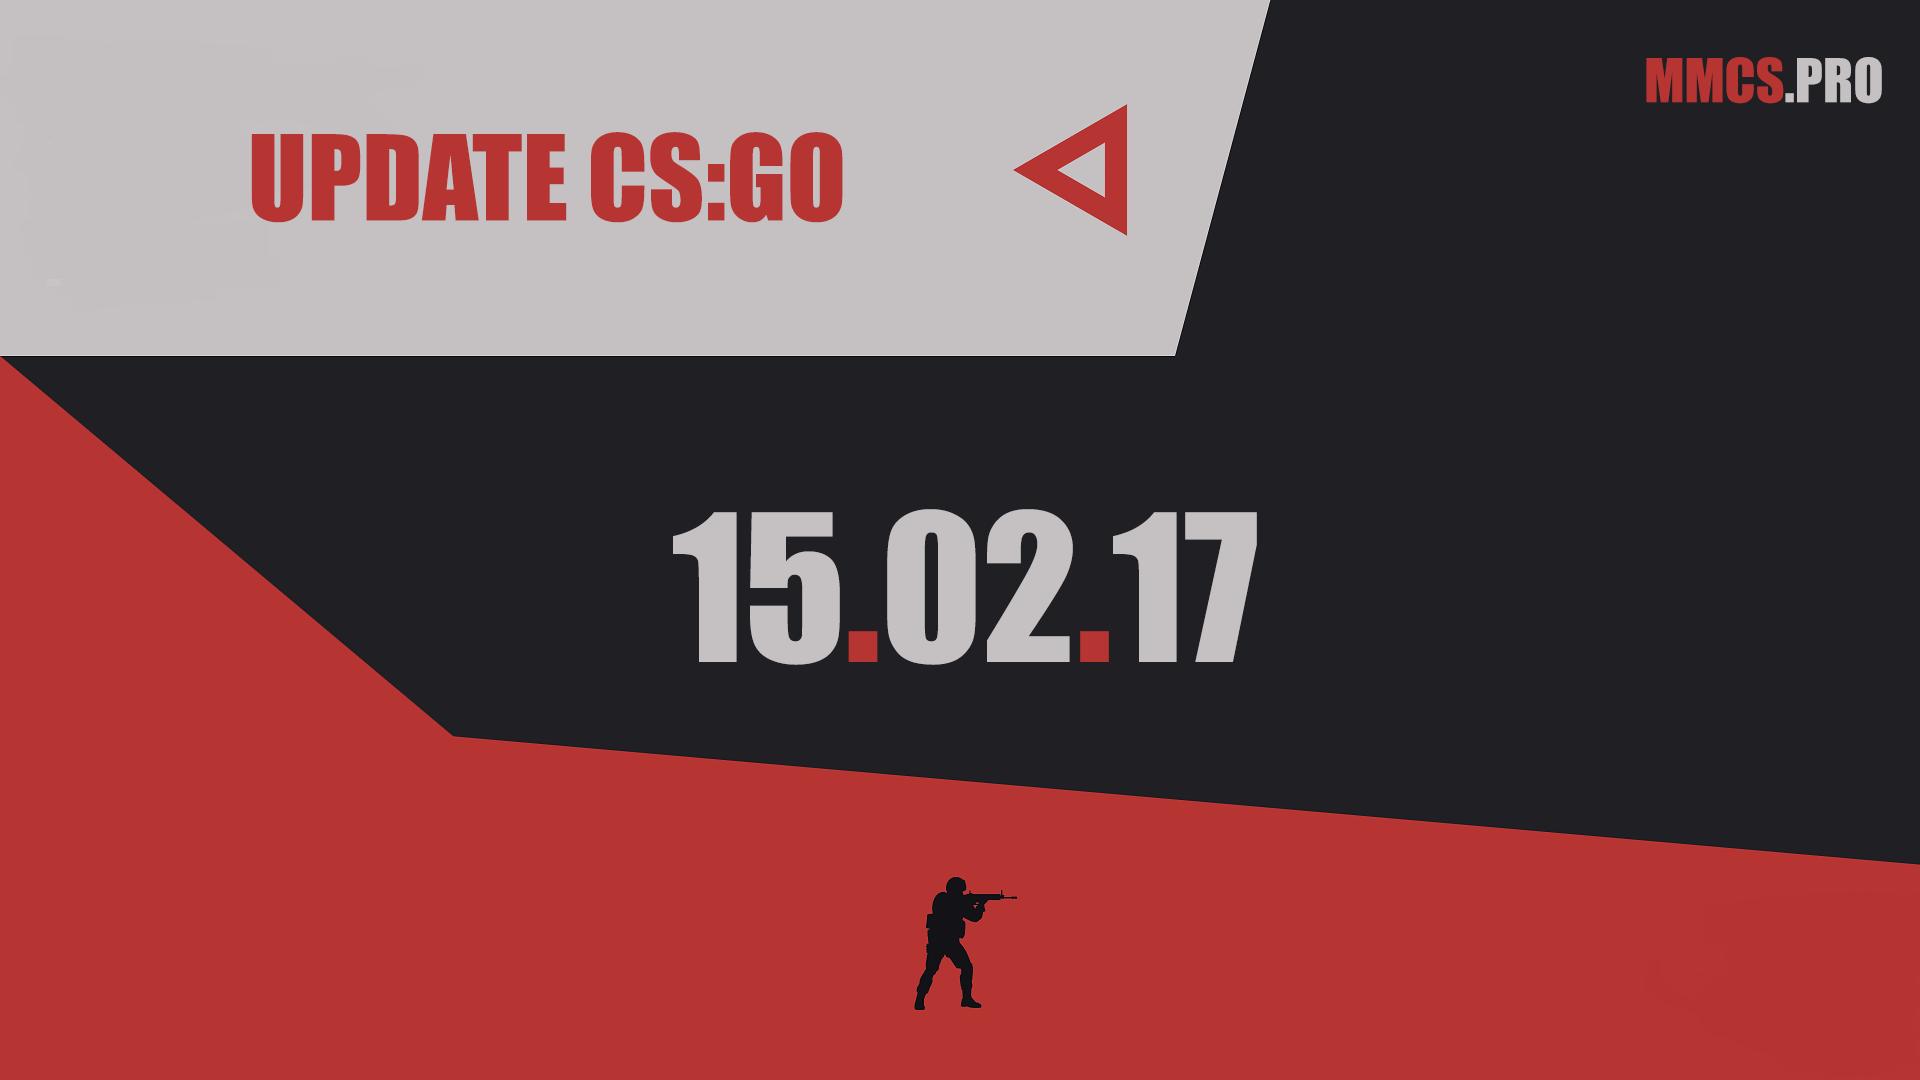 https://mmcs.pro/update-csgo-15-02-2017-valve/